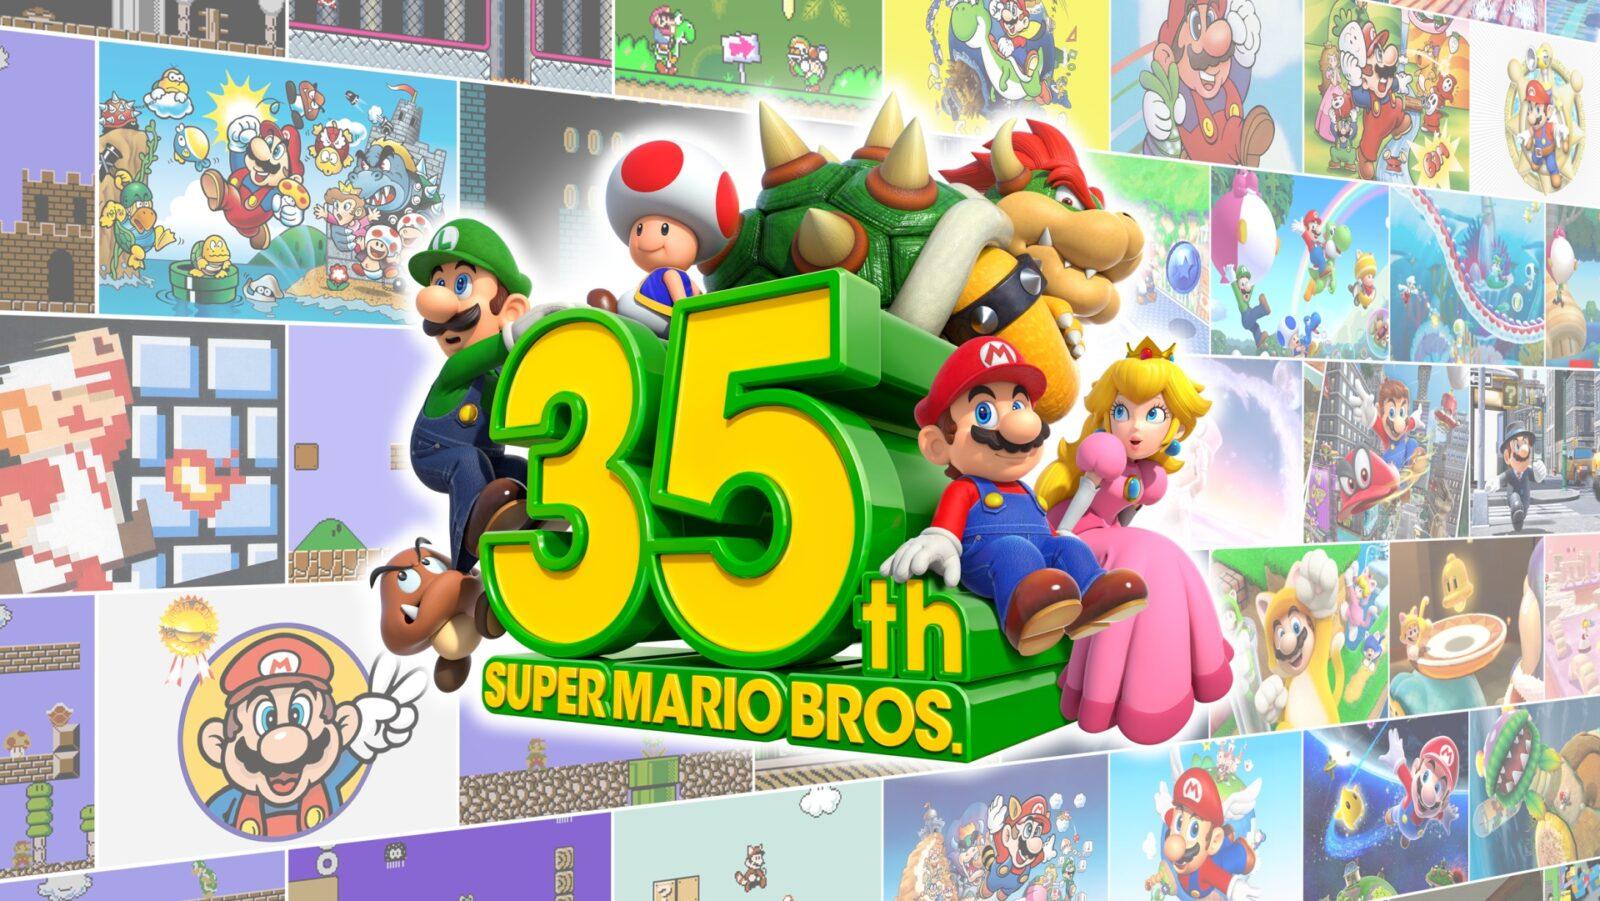 Super Mario Bros 35th Anniversary